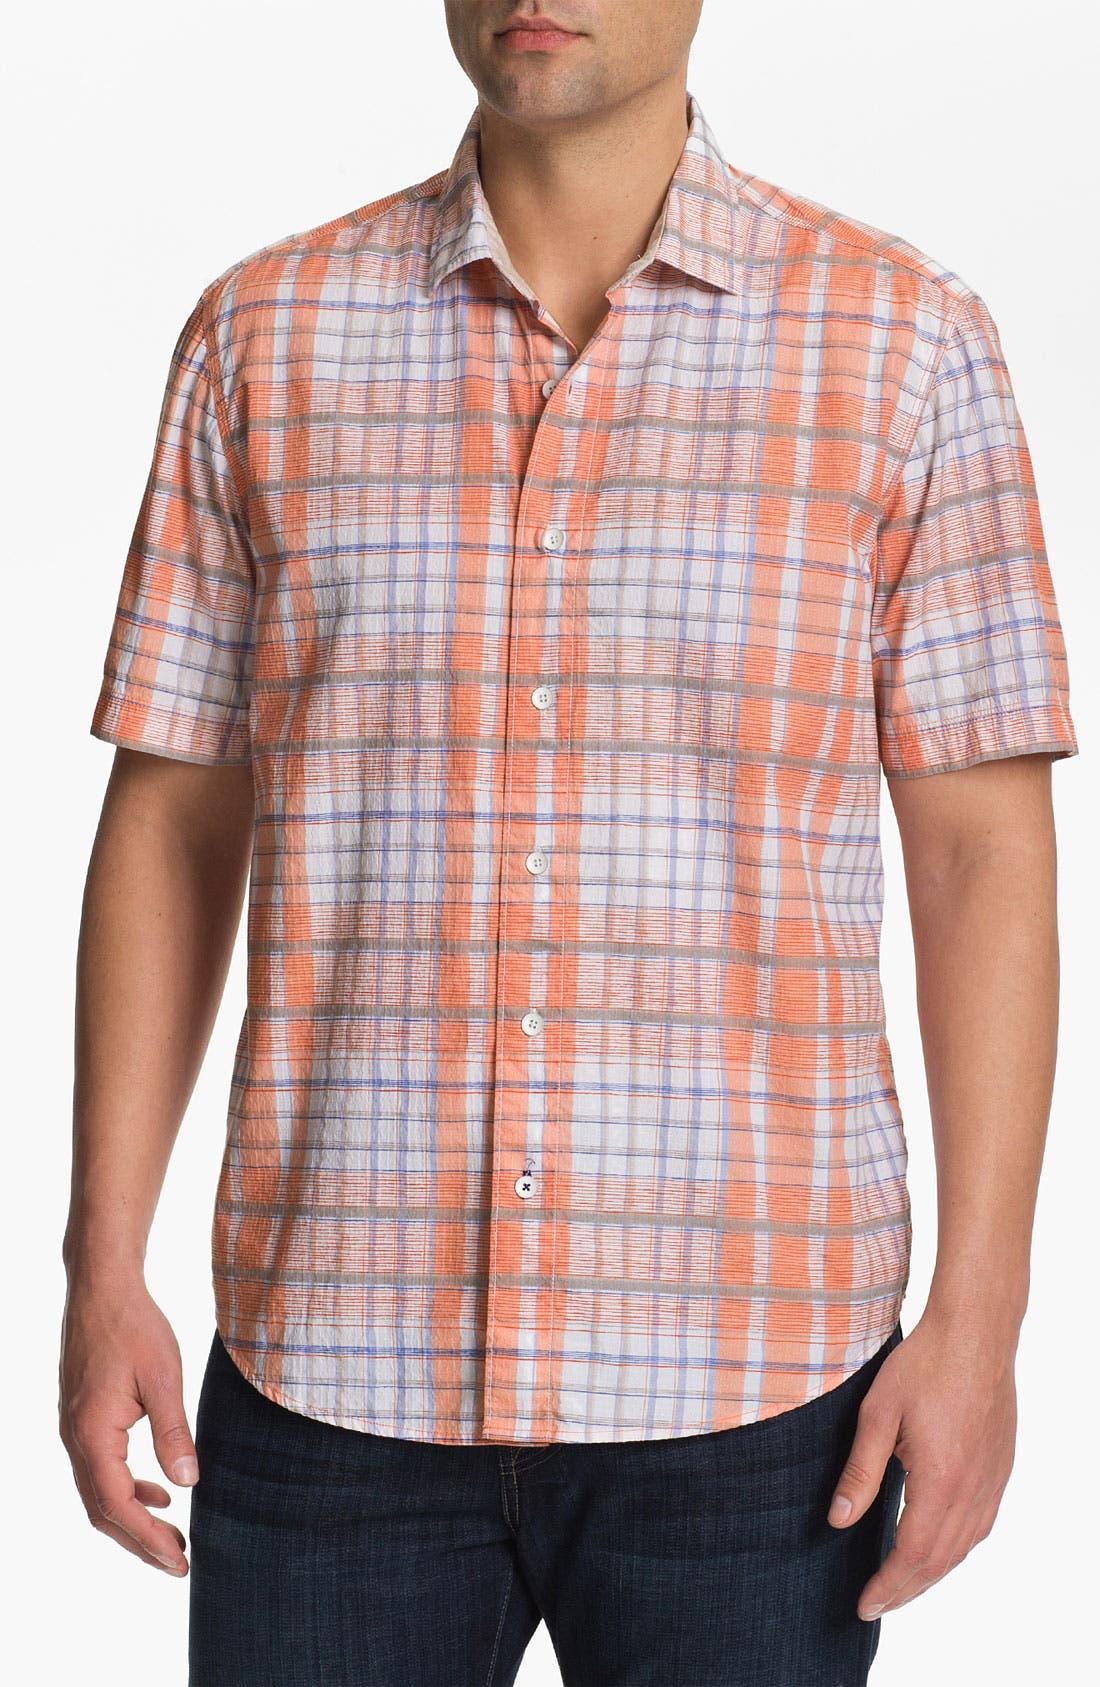 Alternate Image 1 Selected - Tommy Bahama 'Plaidlantic' Regular Fit Short Sleeve Sport Shirt